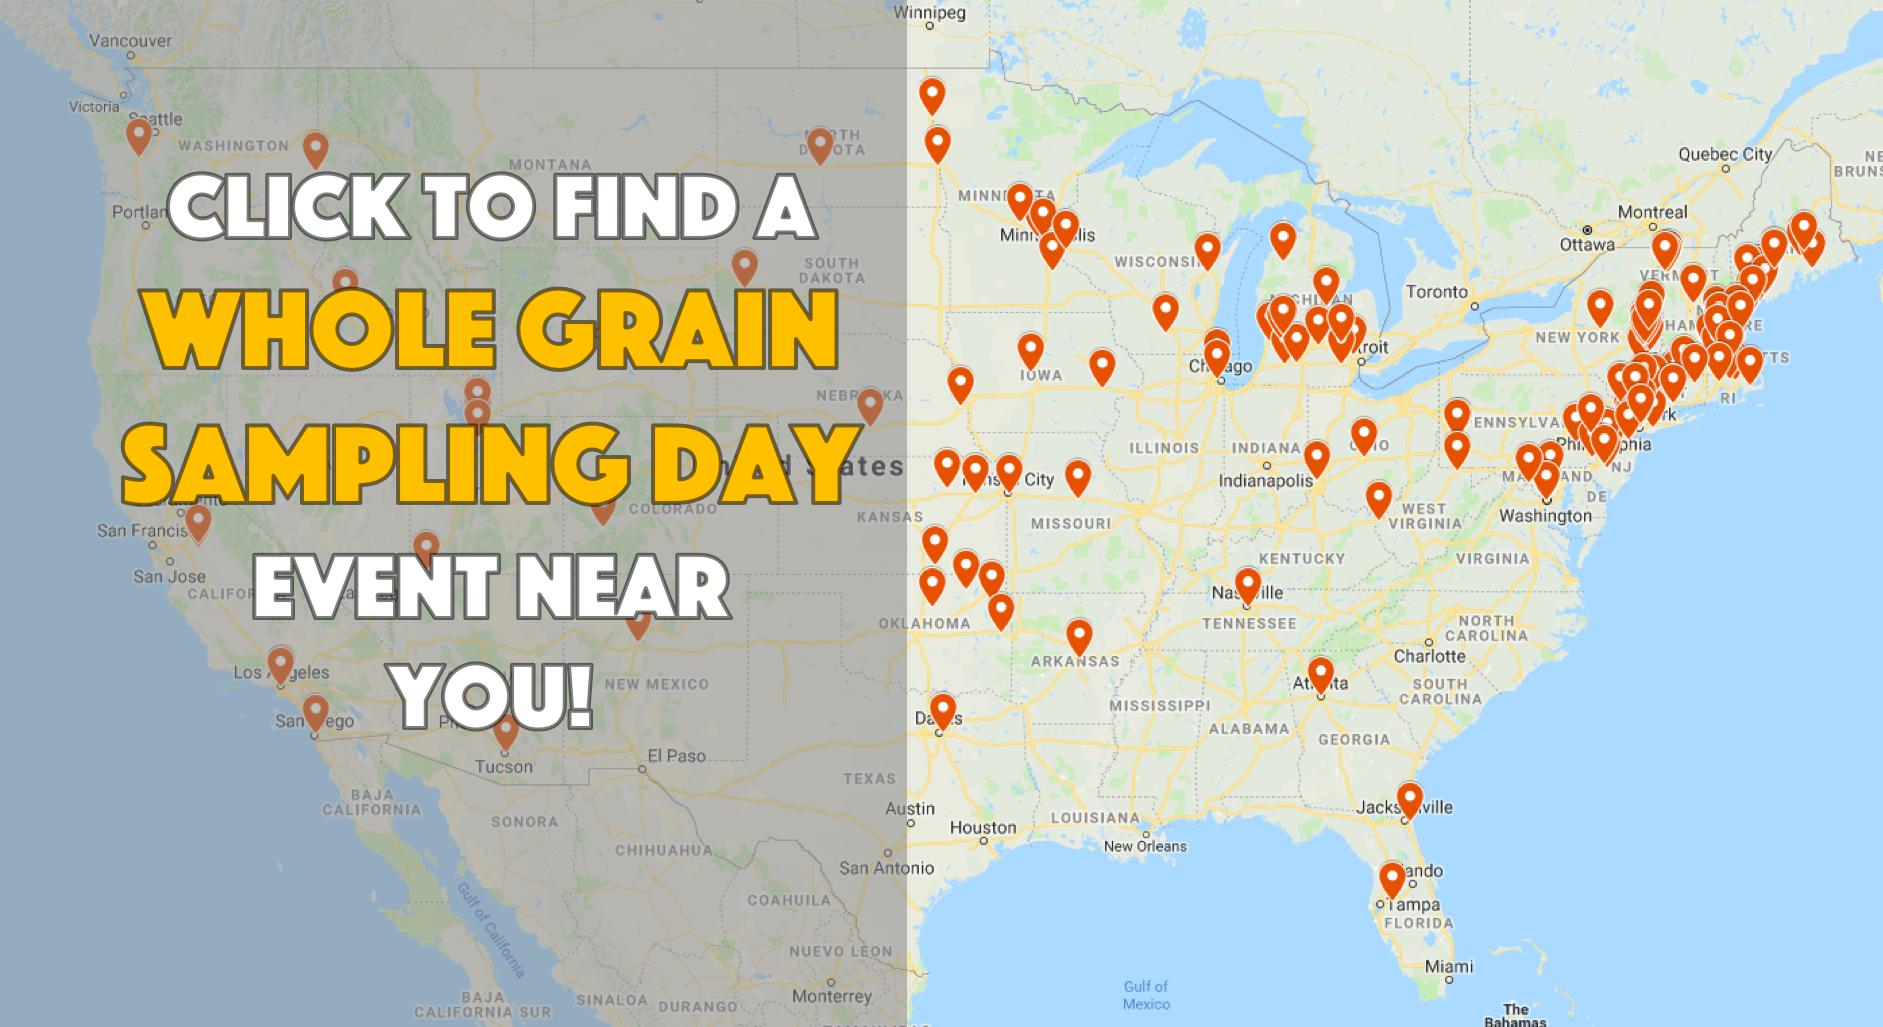 Whole Grain Sampling Day 2019 Map